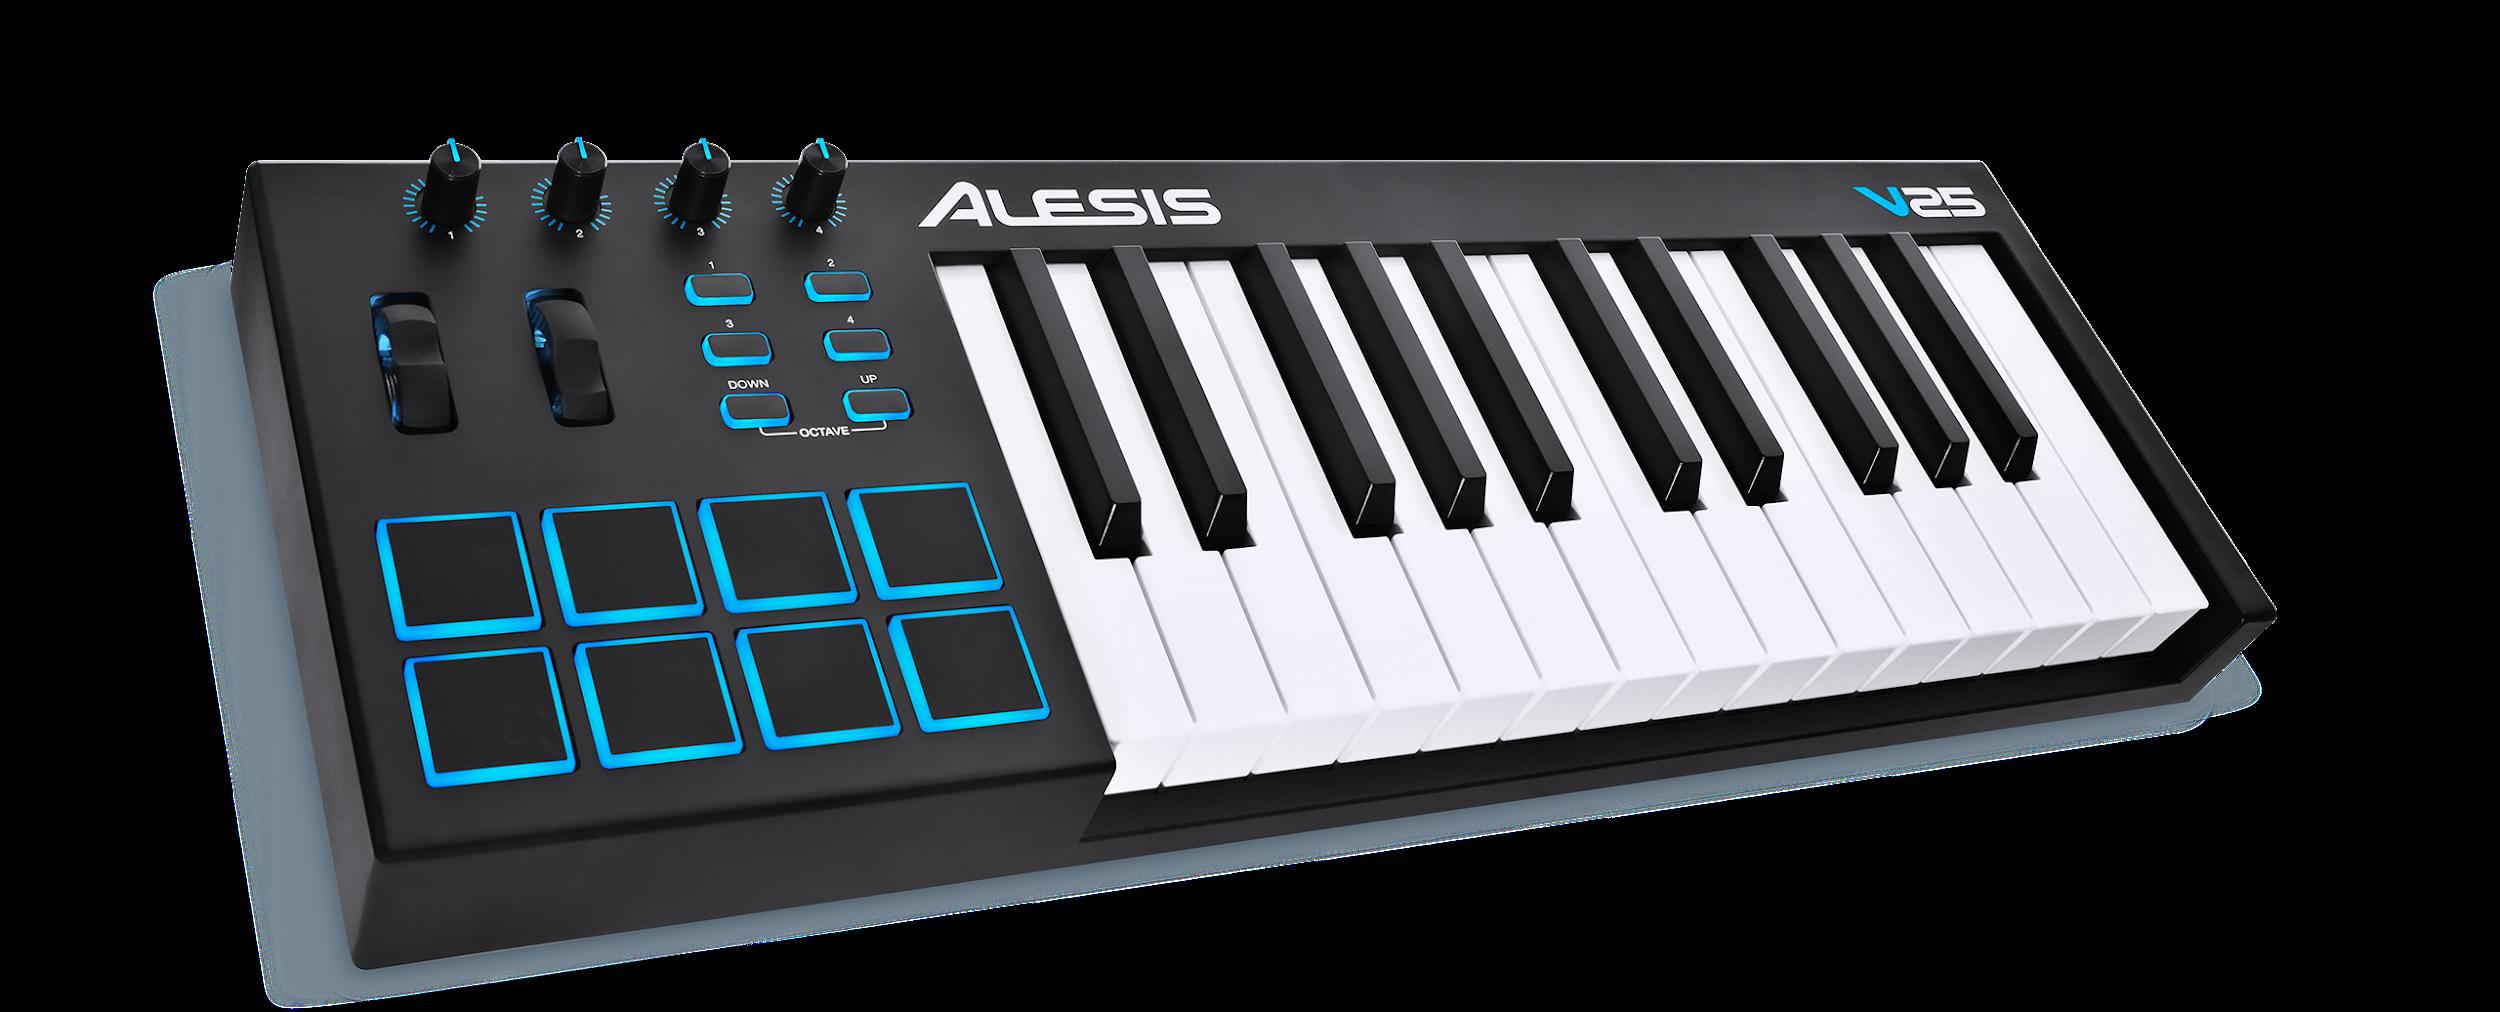 Alesis VI25   25-Key USB MIDI Keyboard Controller with 16 Pads